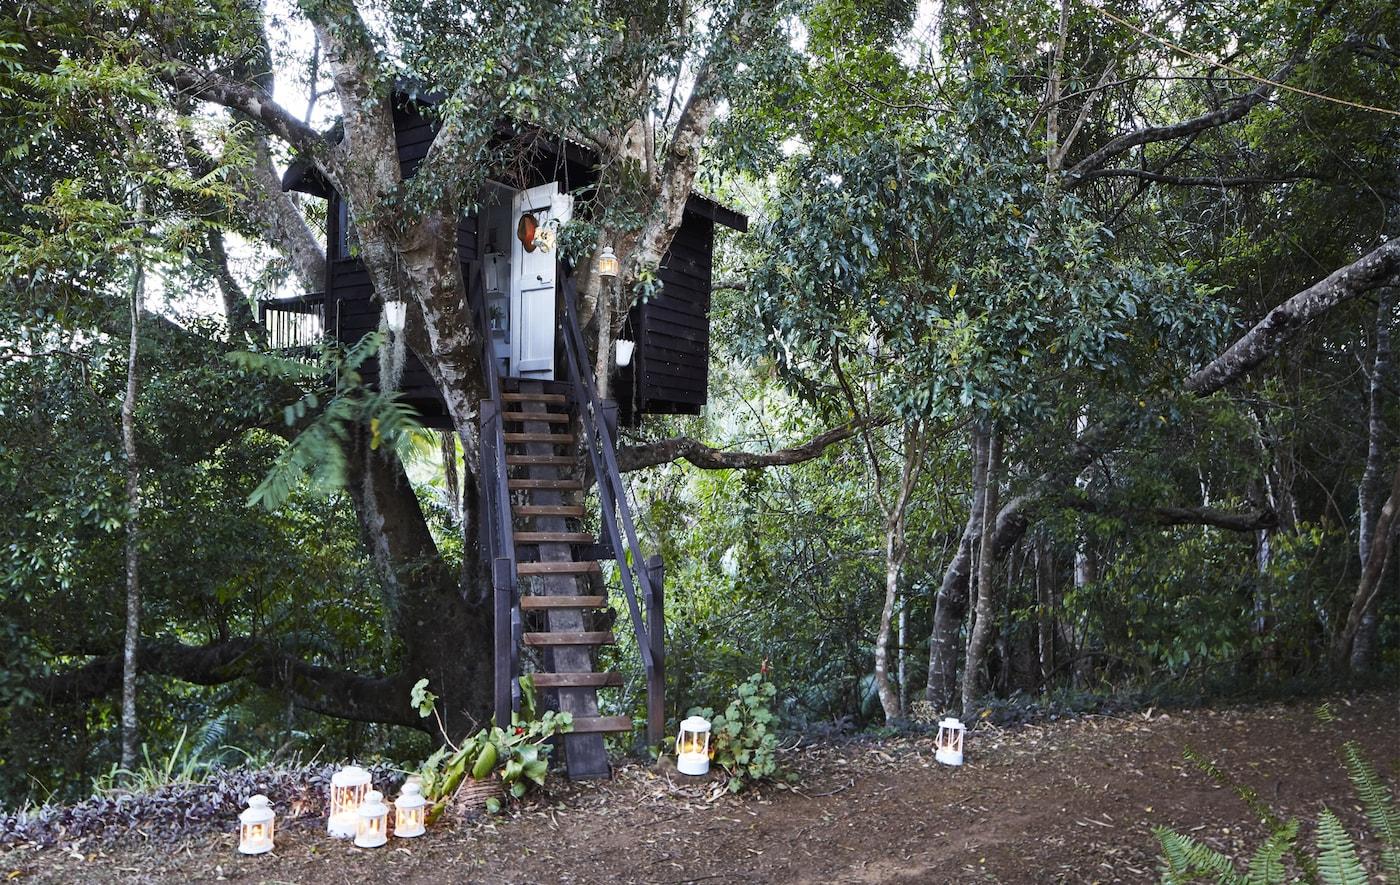 The tree house in Margaret's garden